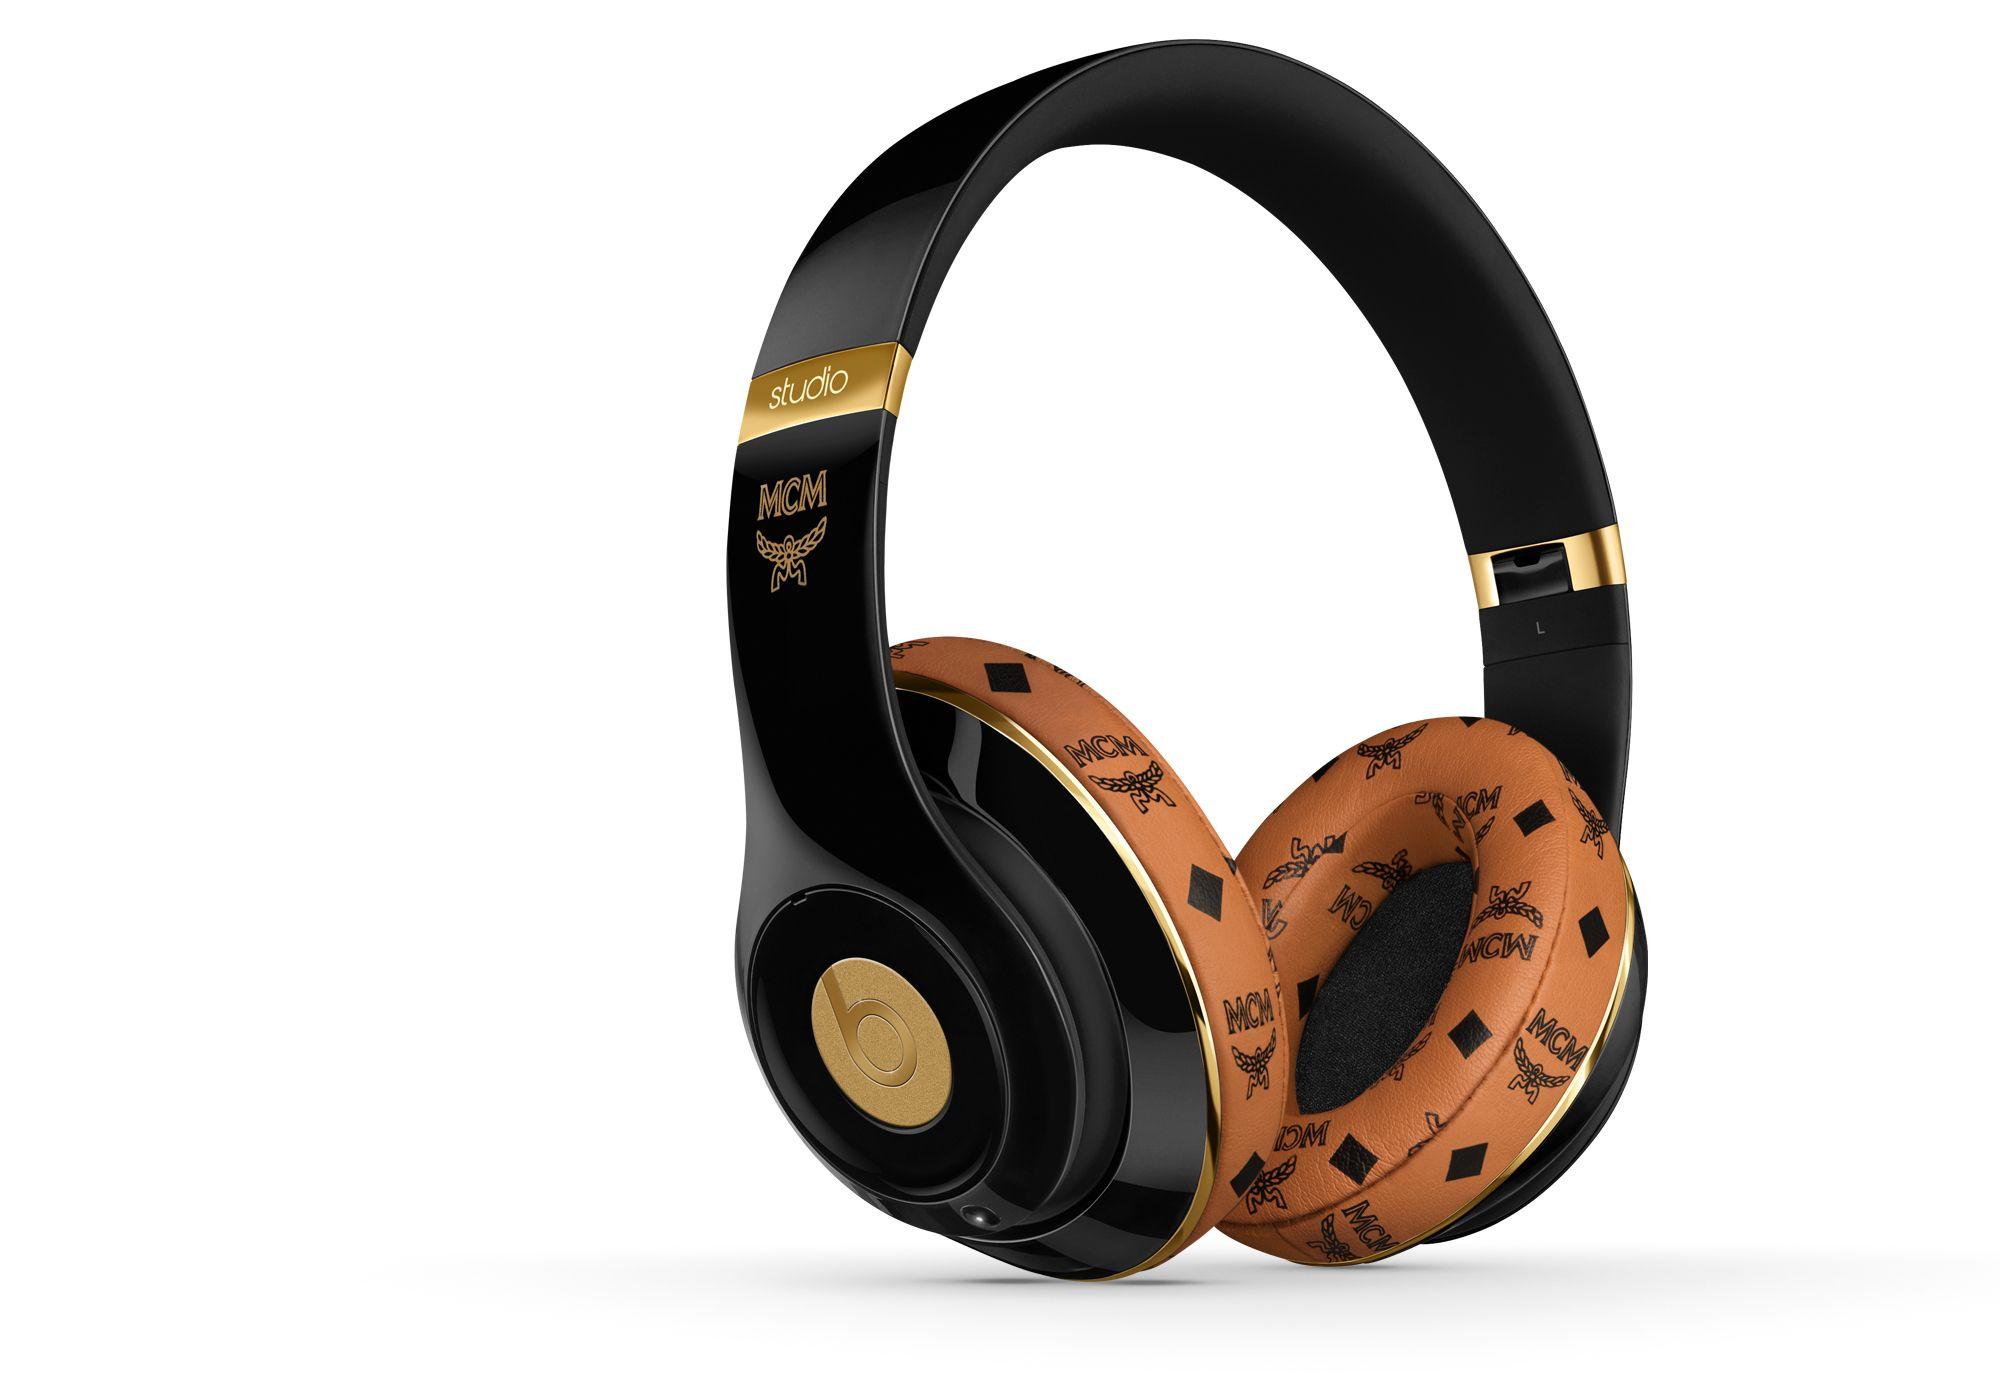 edcd9867227 Beats x MCM Studio Wireless and custom MCM case $540.00 $399.98 ...